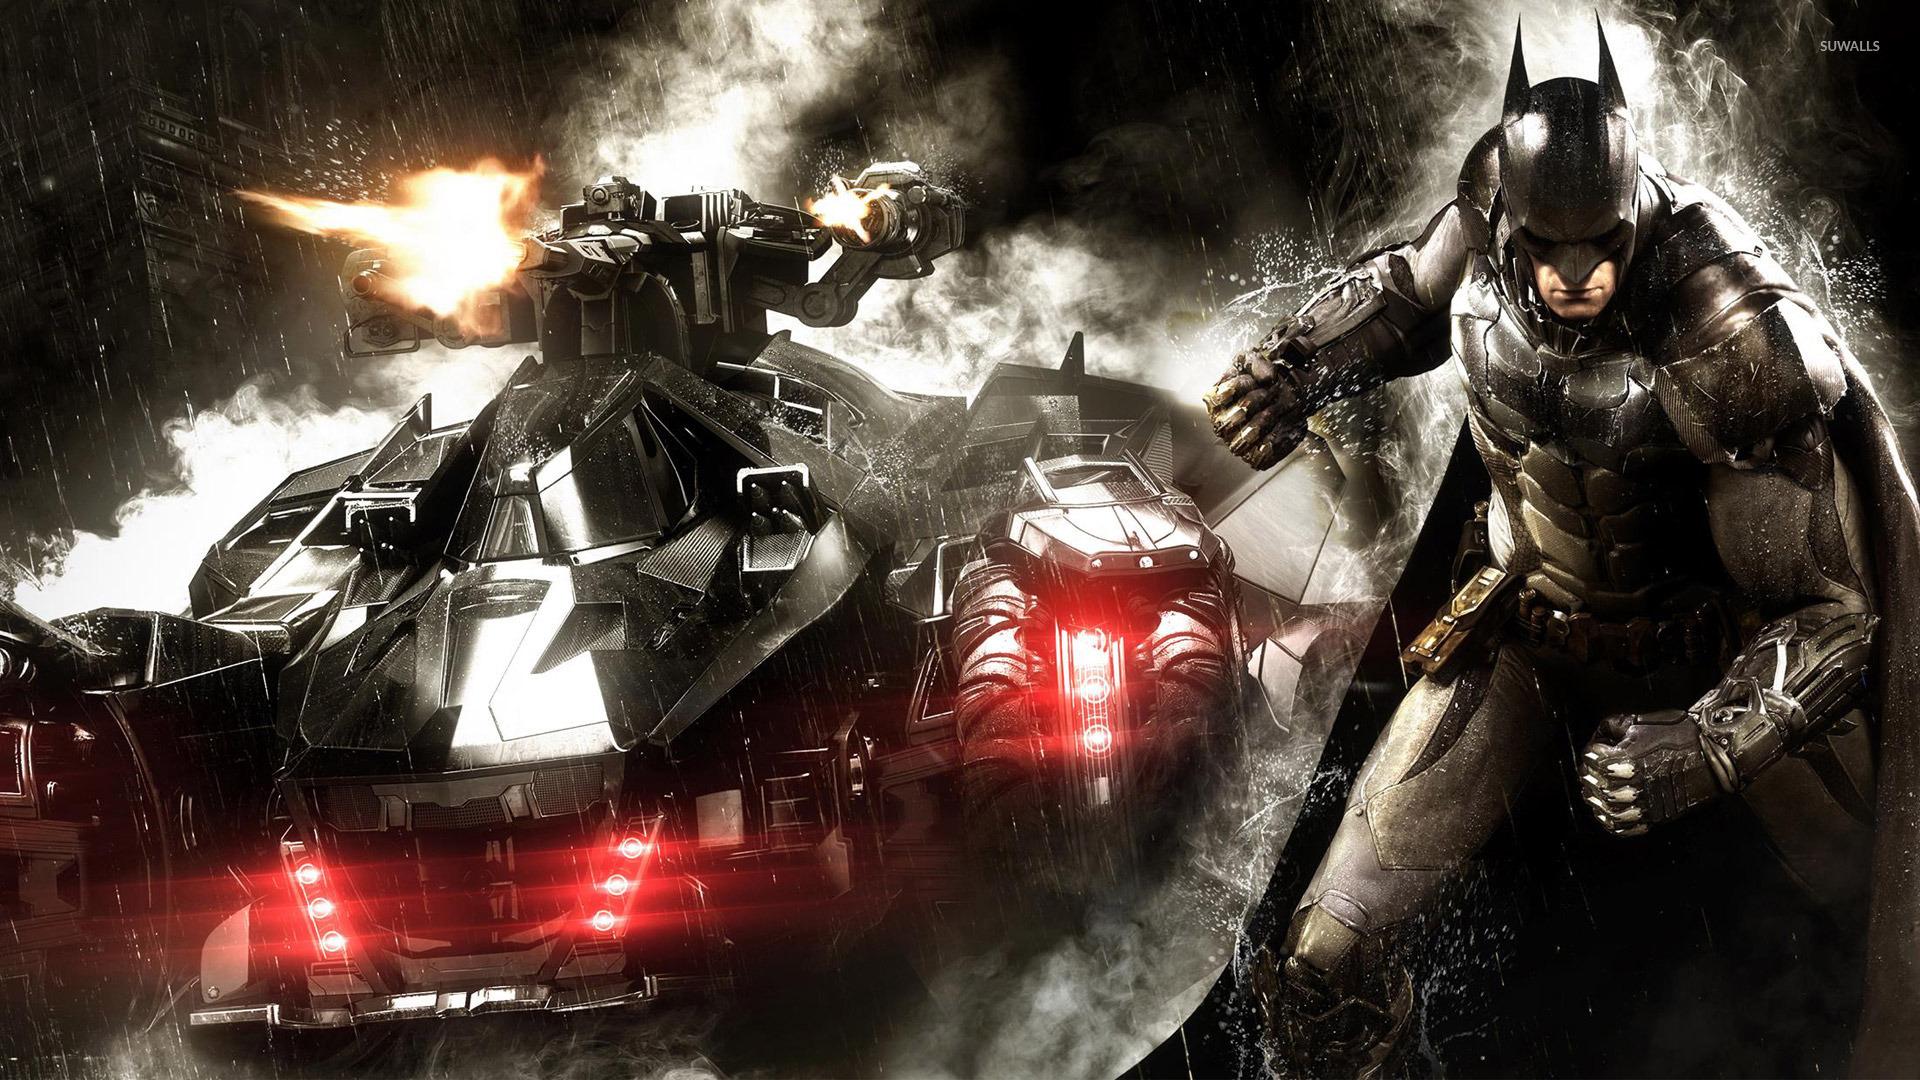 Batman Arkham Knight 11 Wallpaper Game Wallpapers 31356